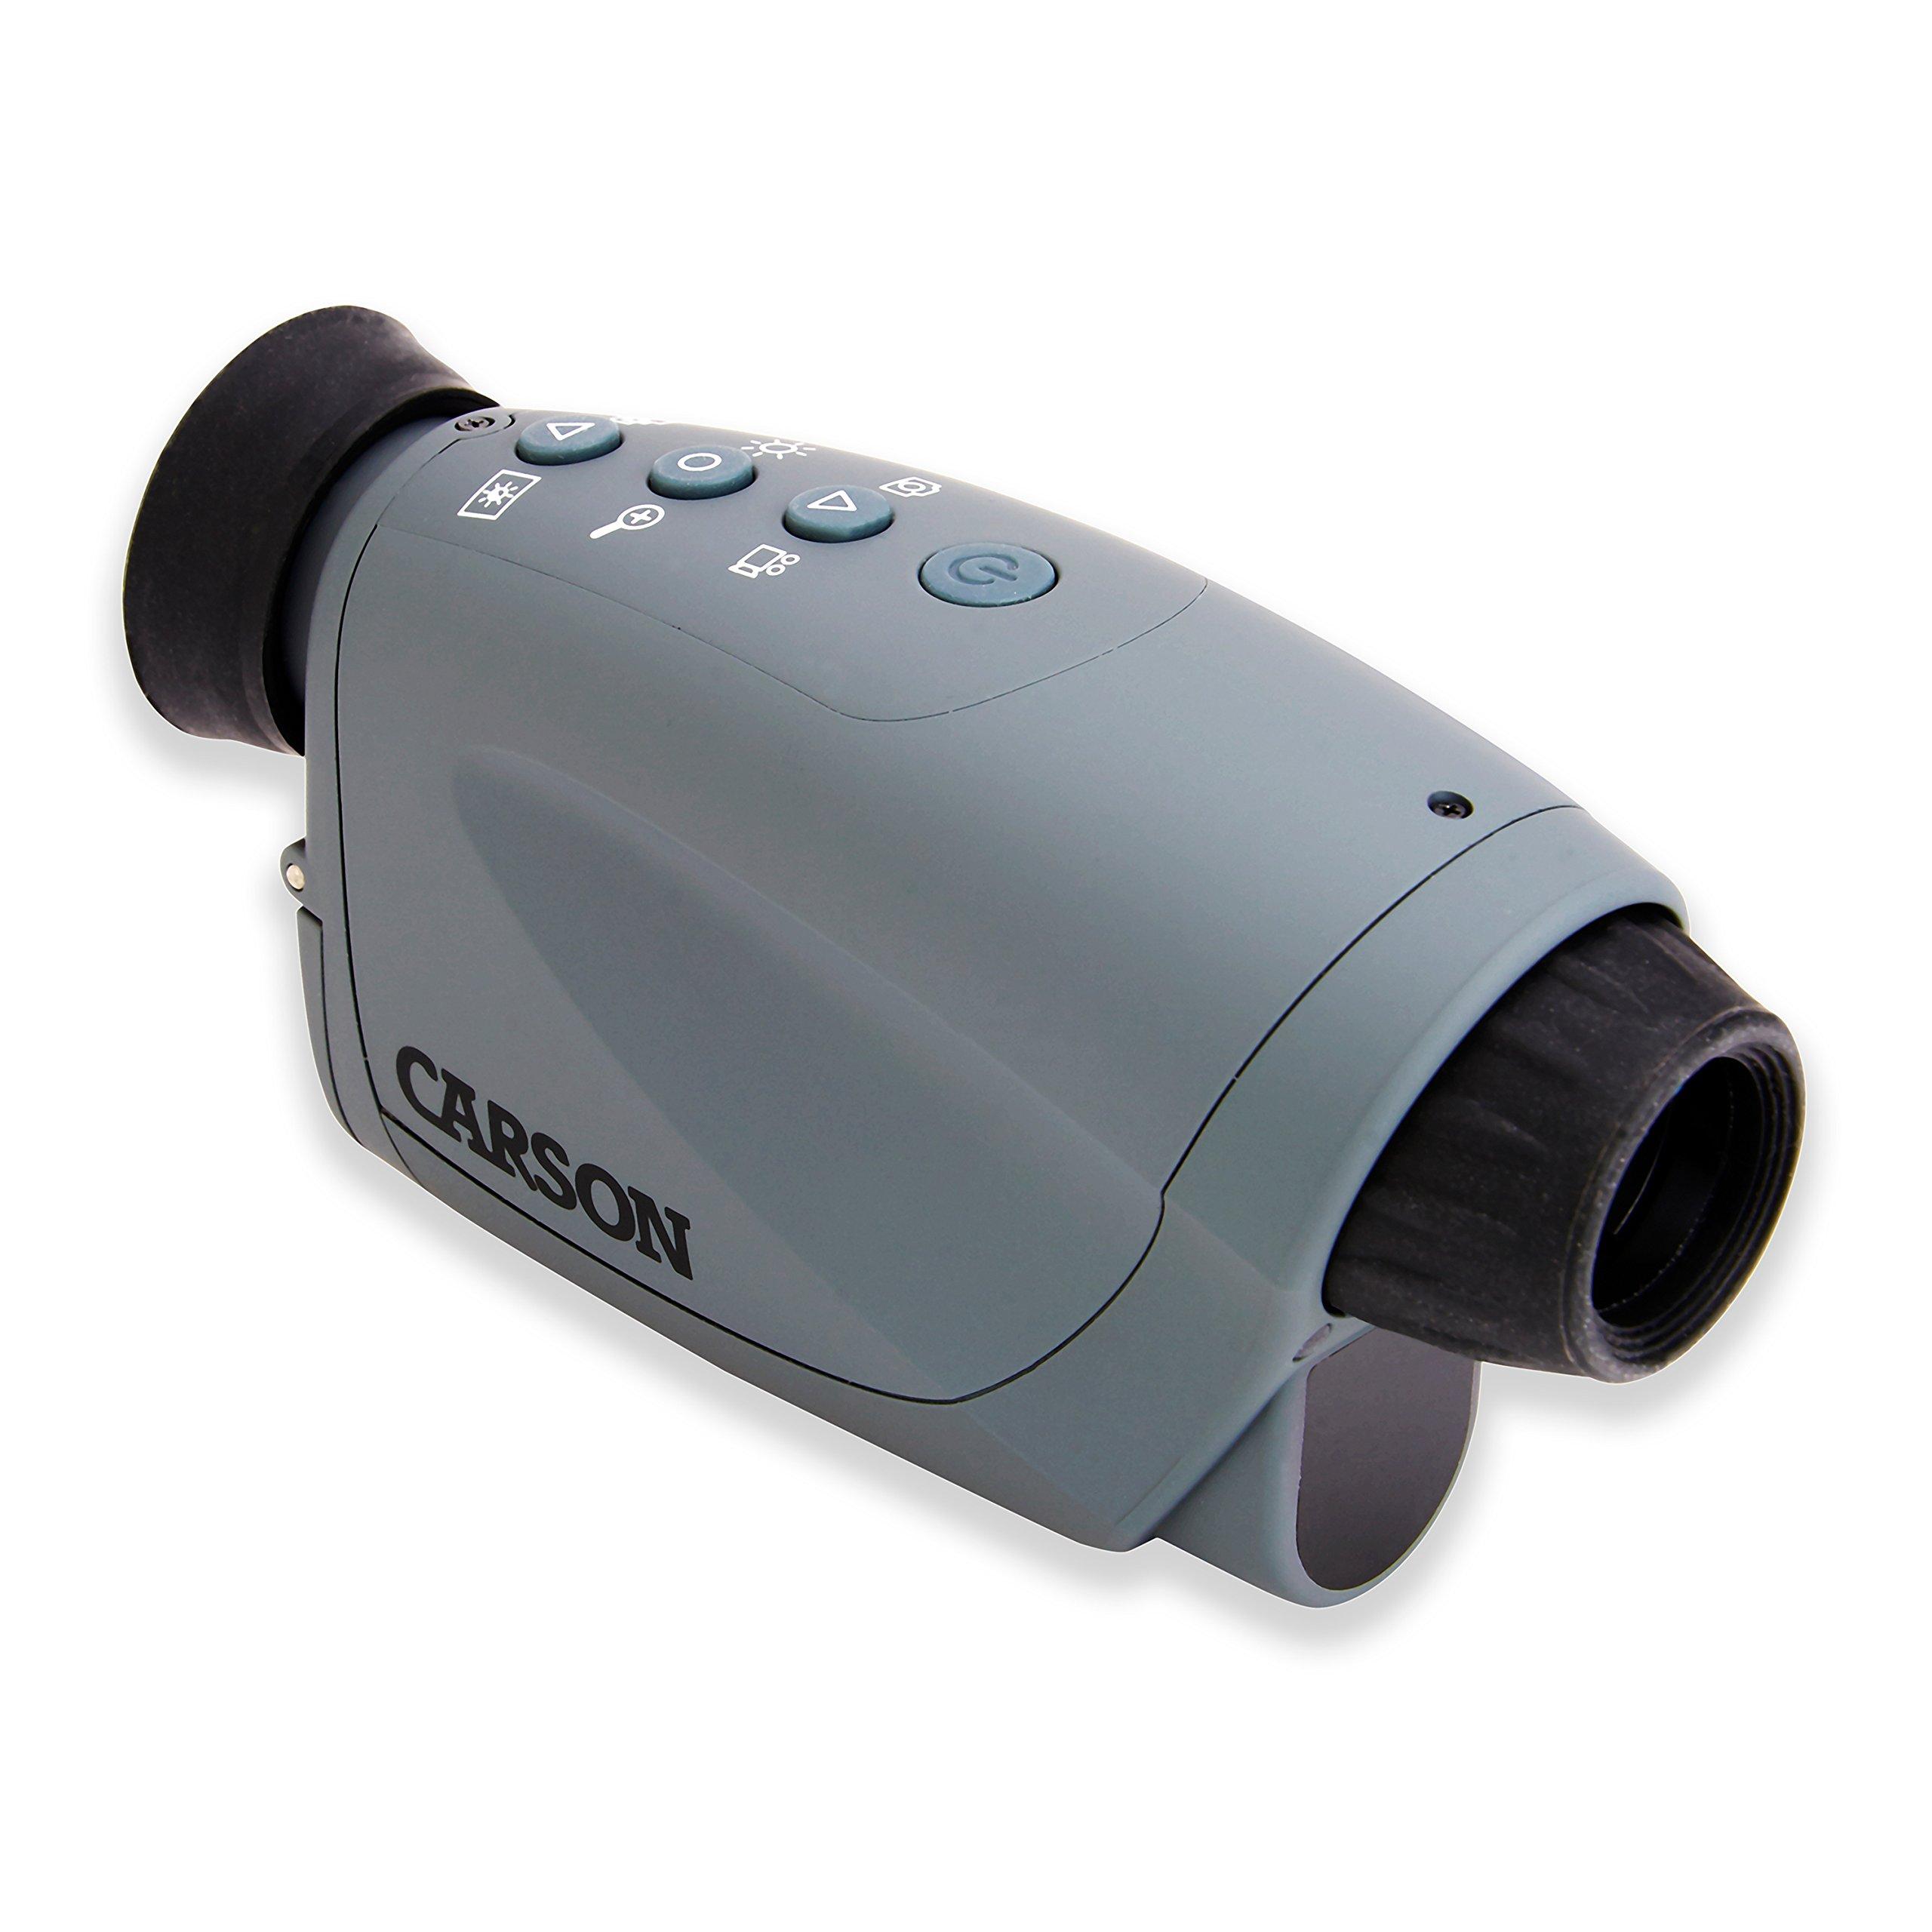 Carson AuraPlus 2x Power Digital Night Vision Camcorder with 8GB MicroSD Card (NV-250) by Carson